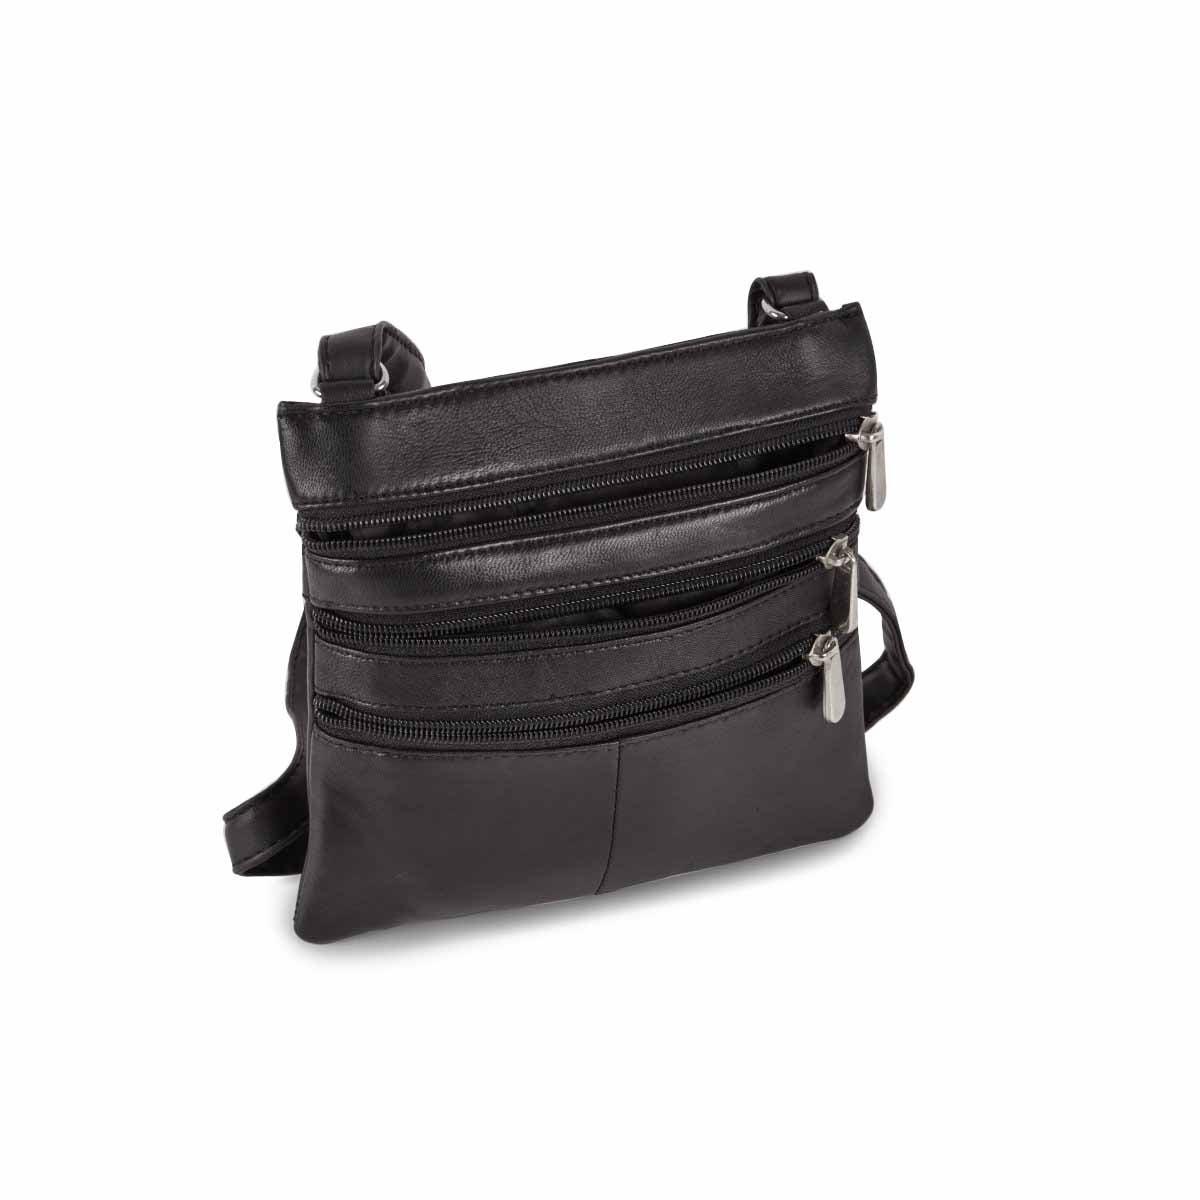 Women's 1027  black sheep leather crossbody bag